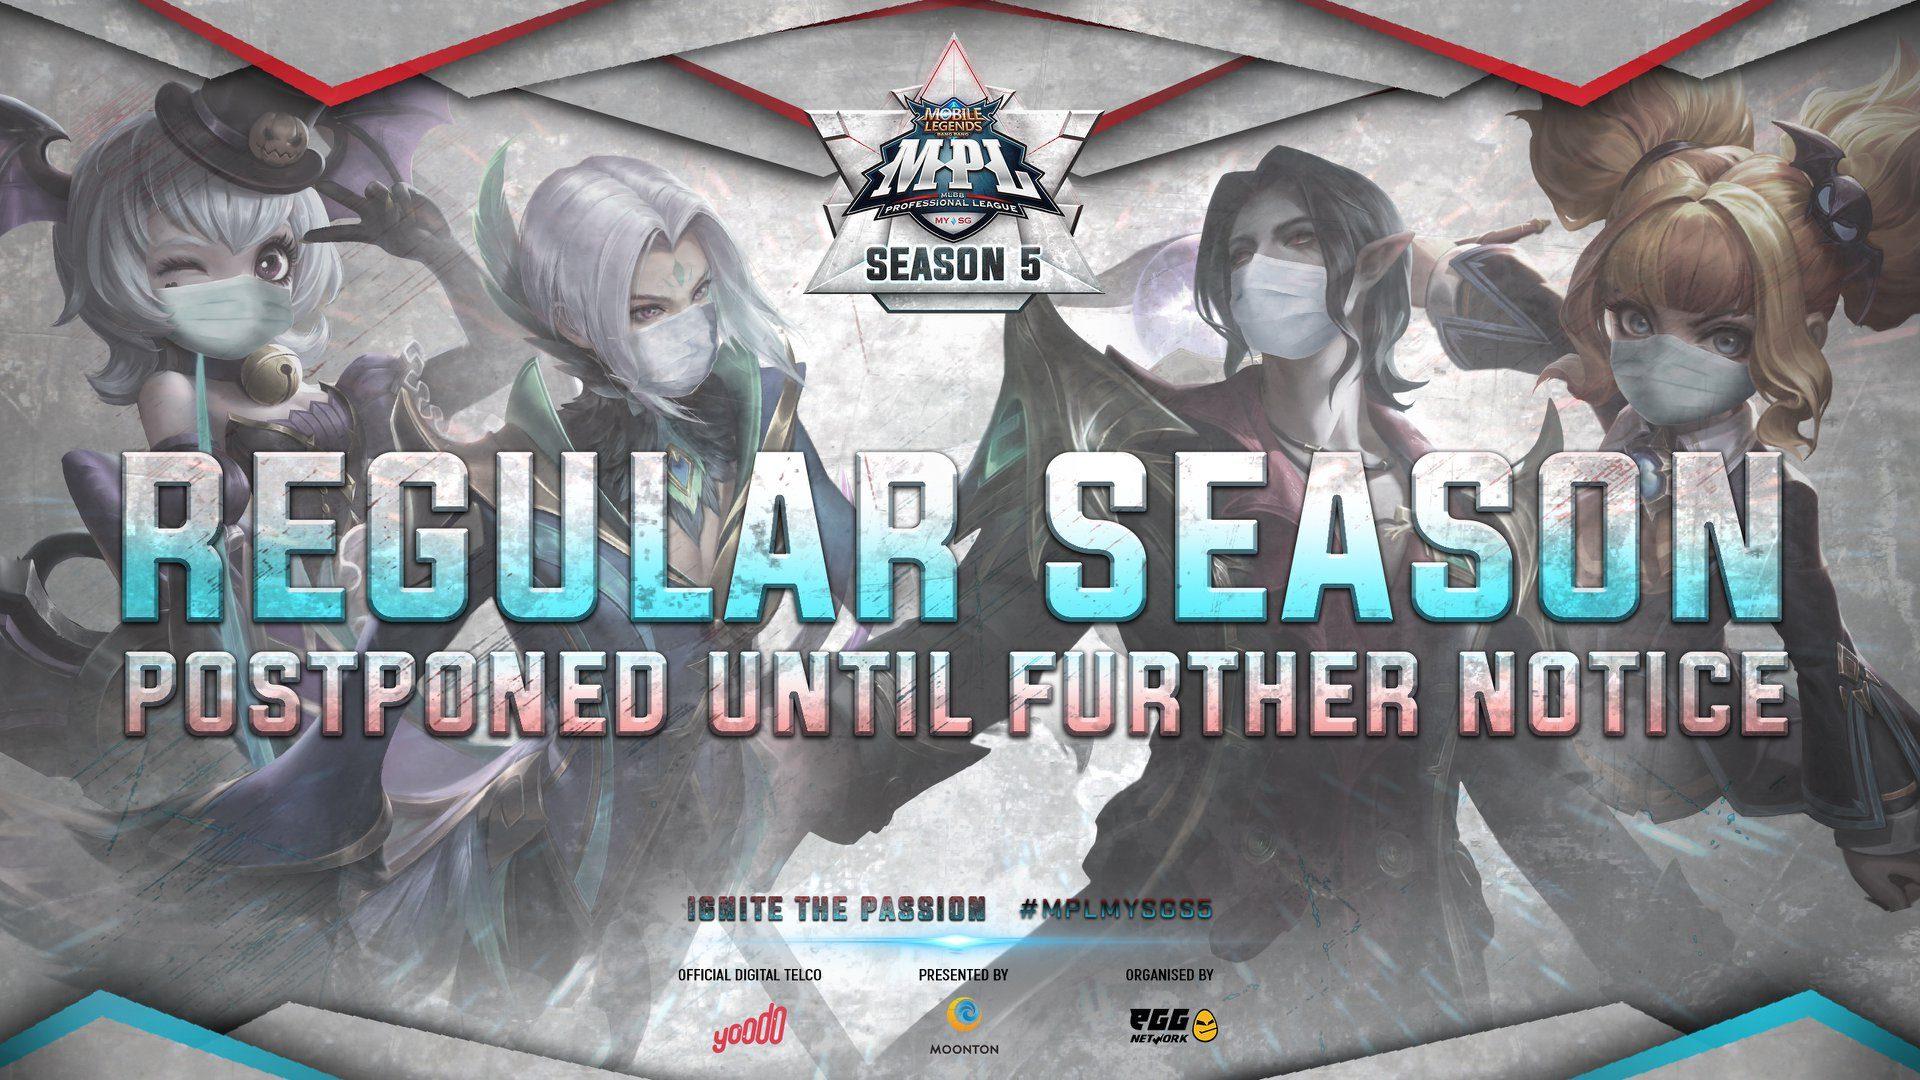 Mobile Legends: Musim Liga MPL Ditunda Berikutan Wabak COVID-19